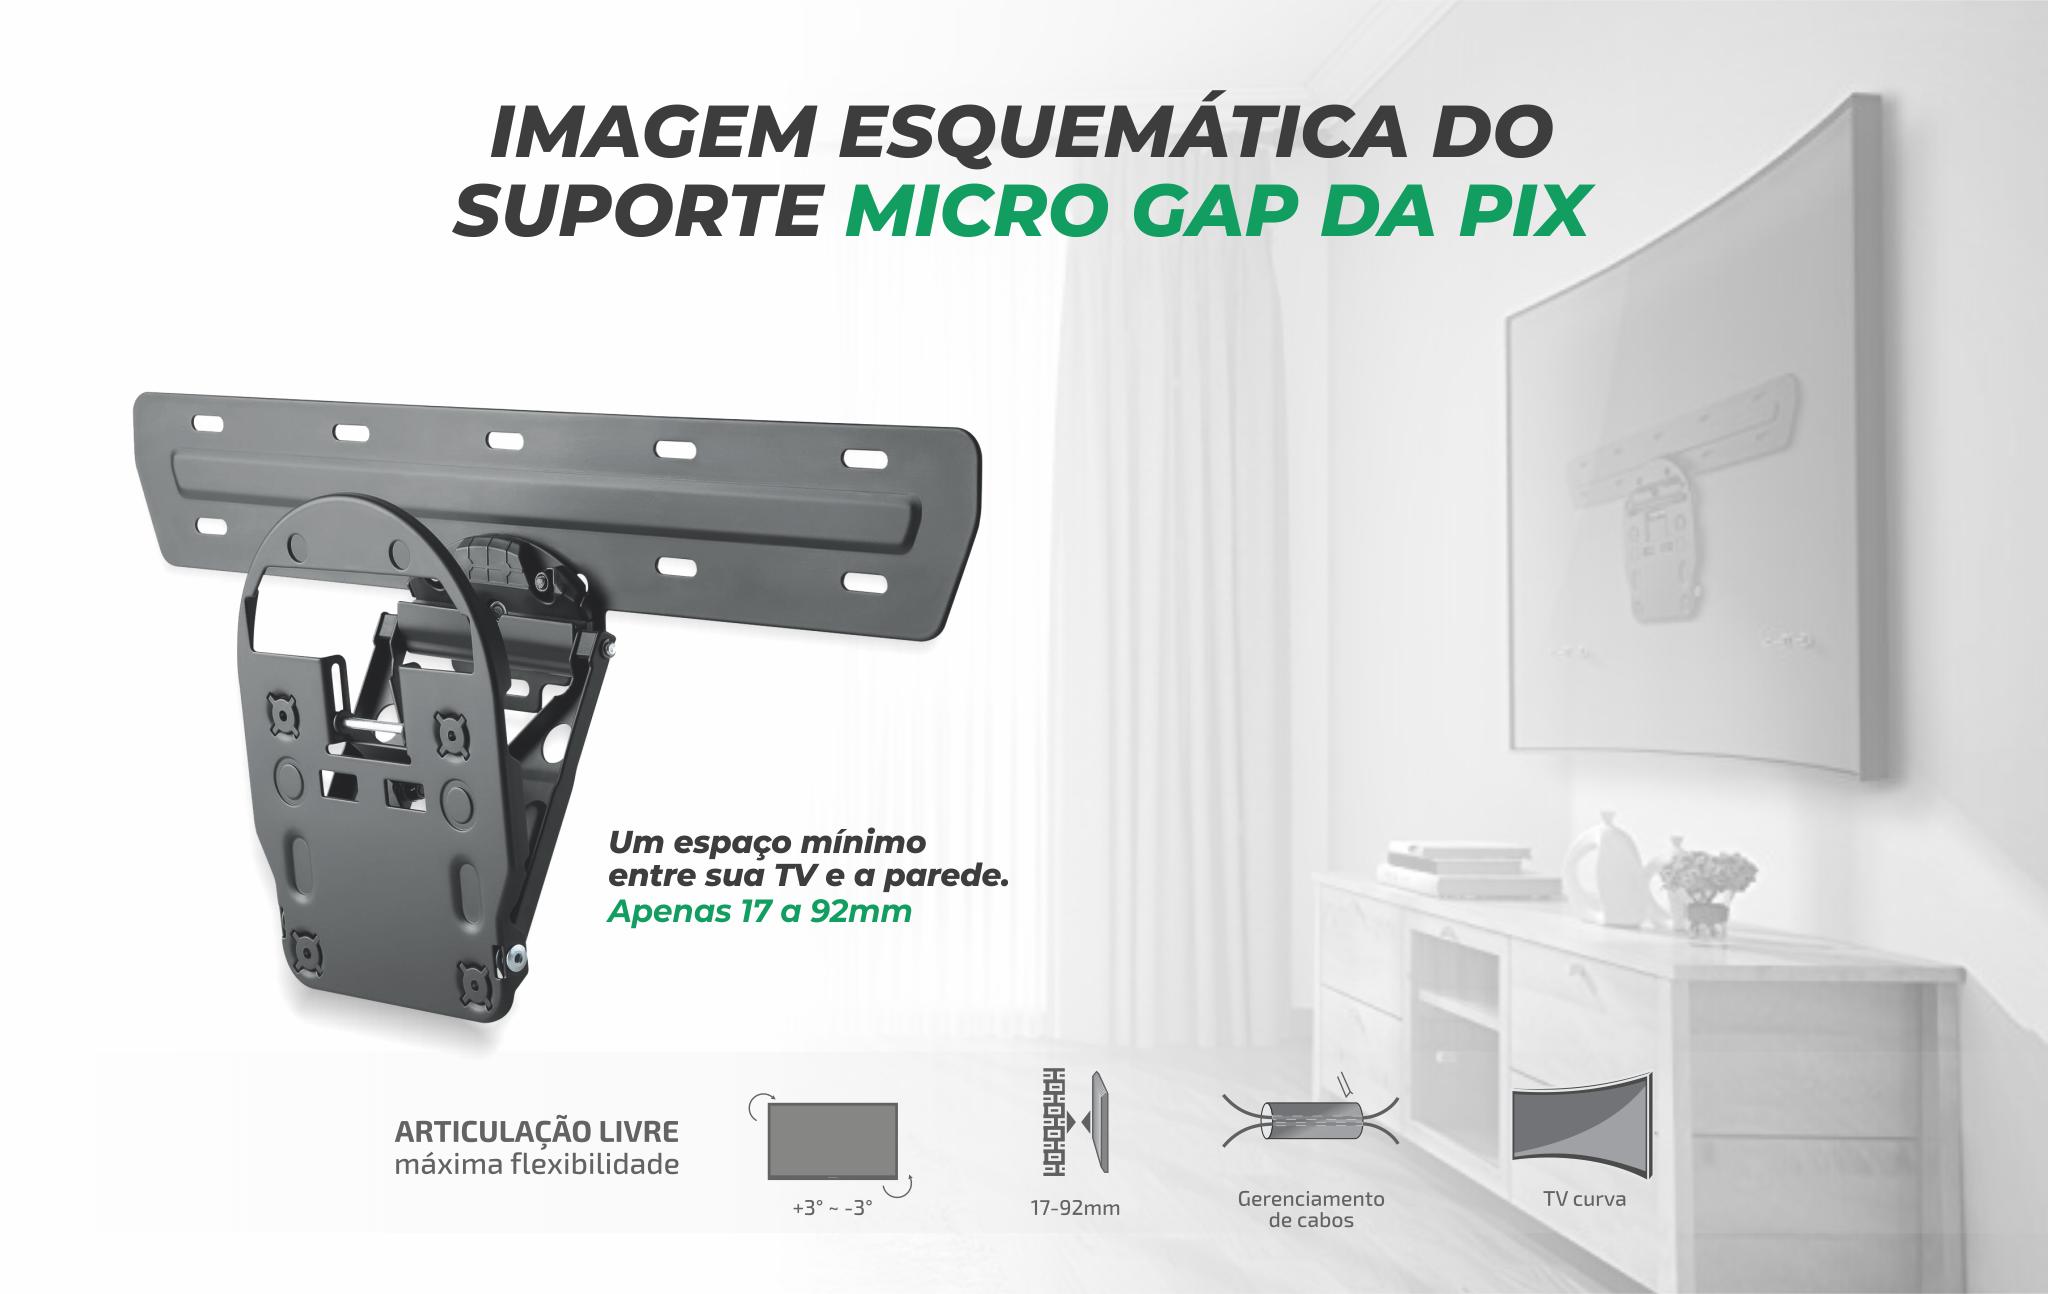 Suporte Micro Gap PIX